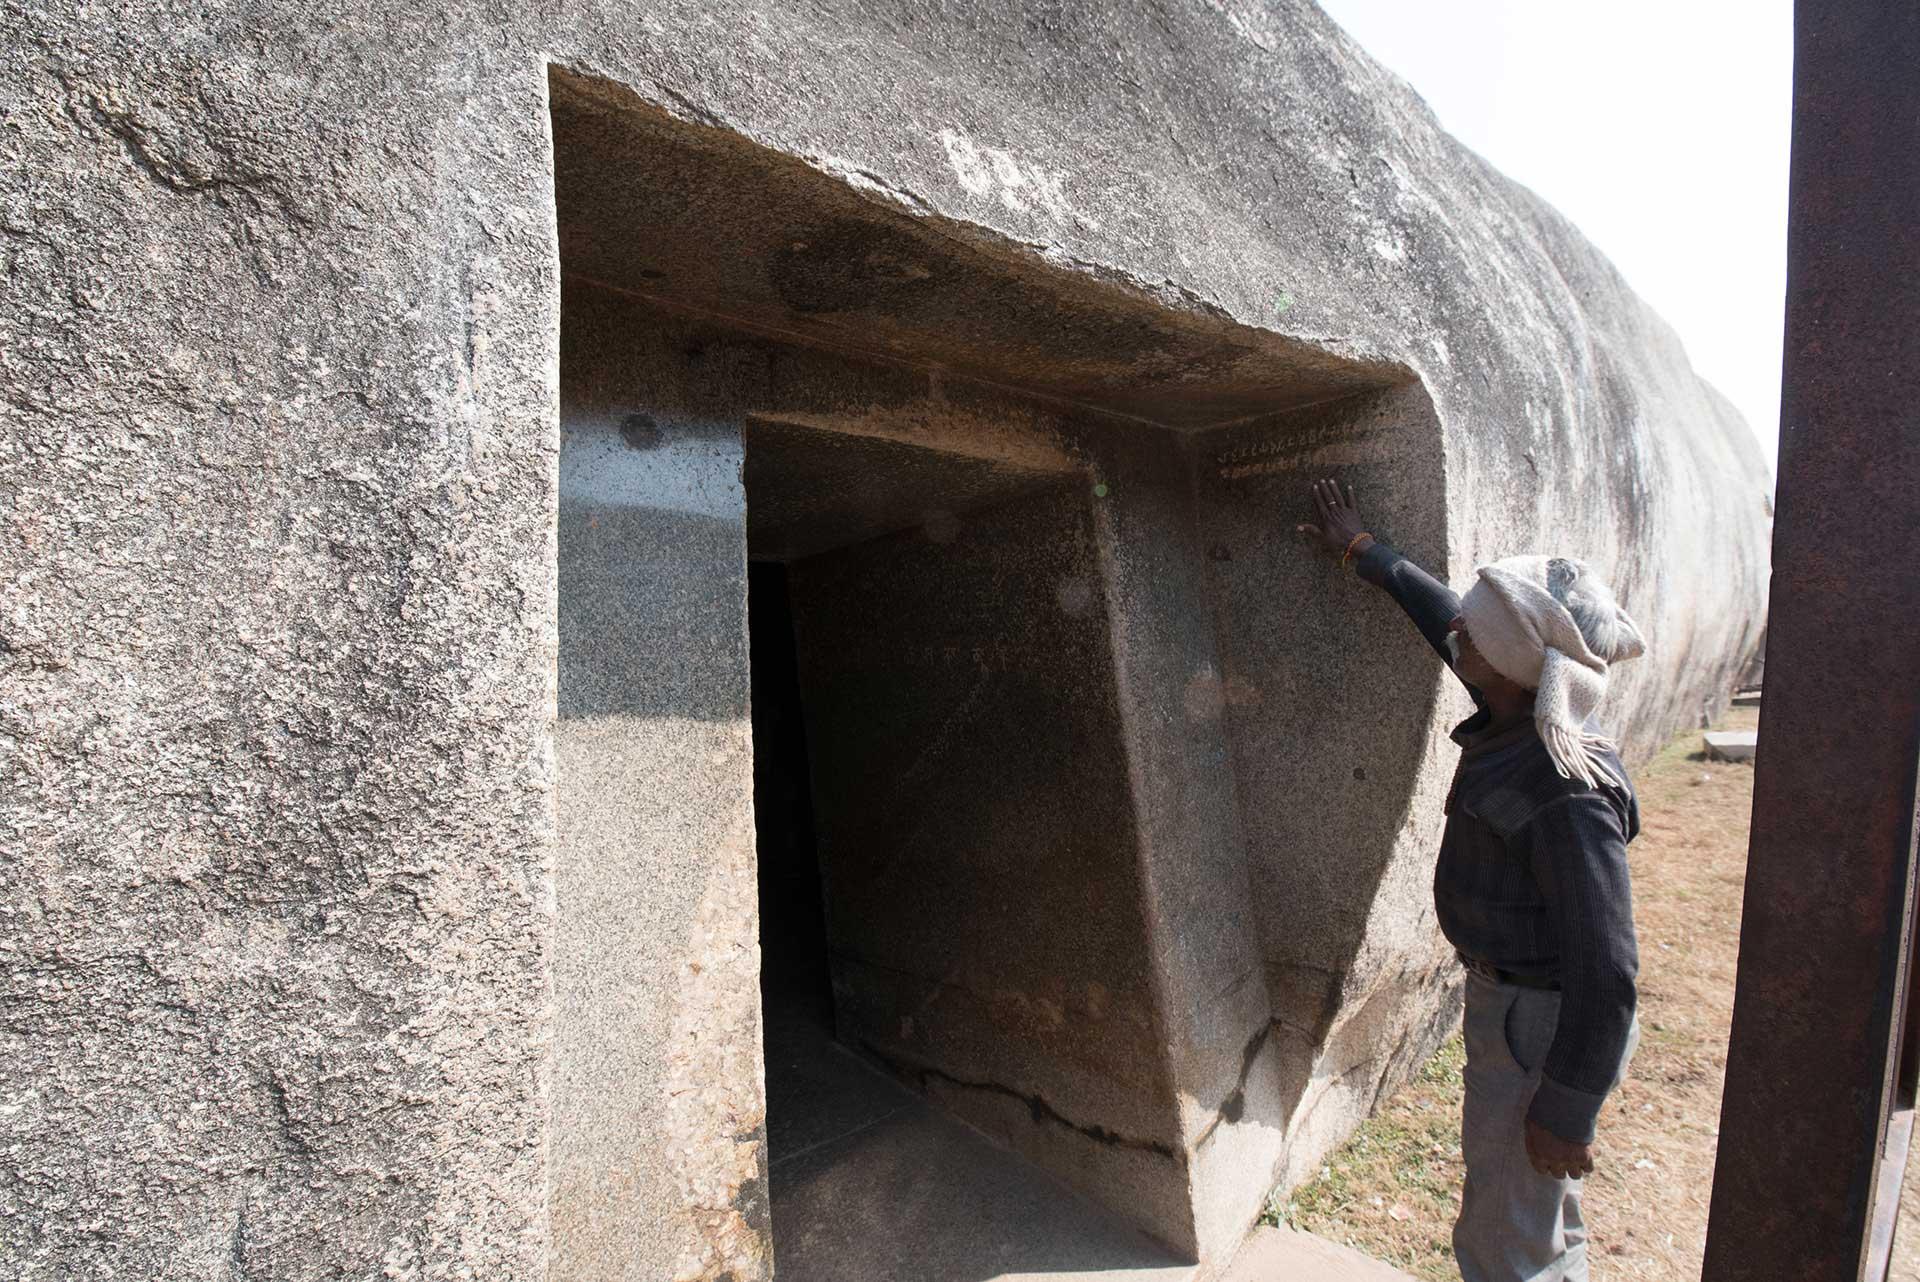 Barabar-BAM-film-granit-miroir-pyramide-inde-yoga-archeologie-11